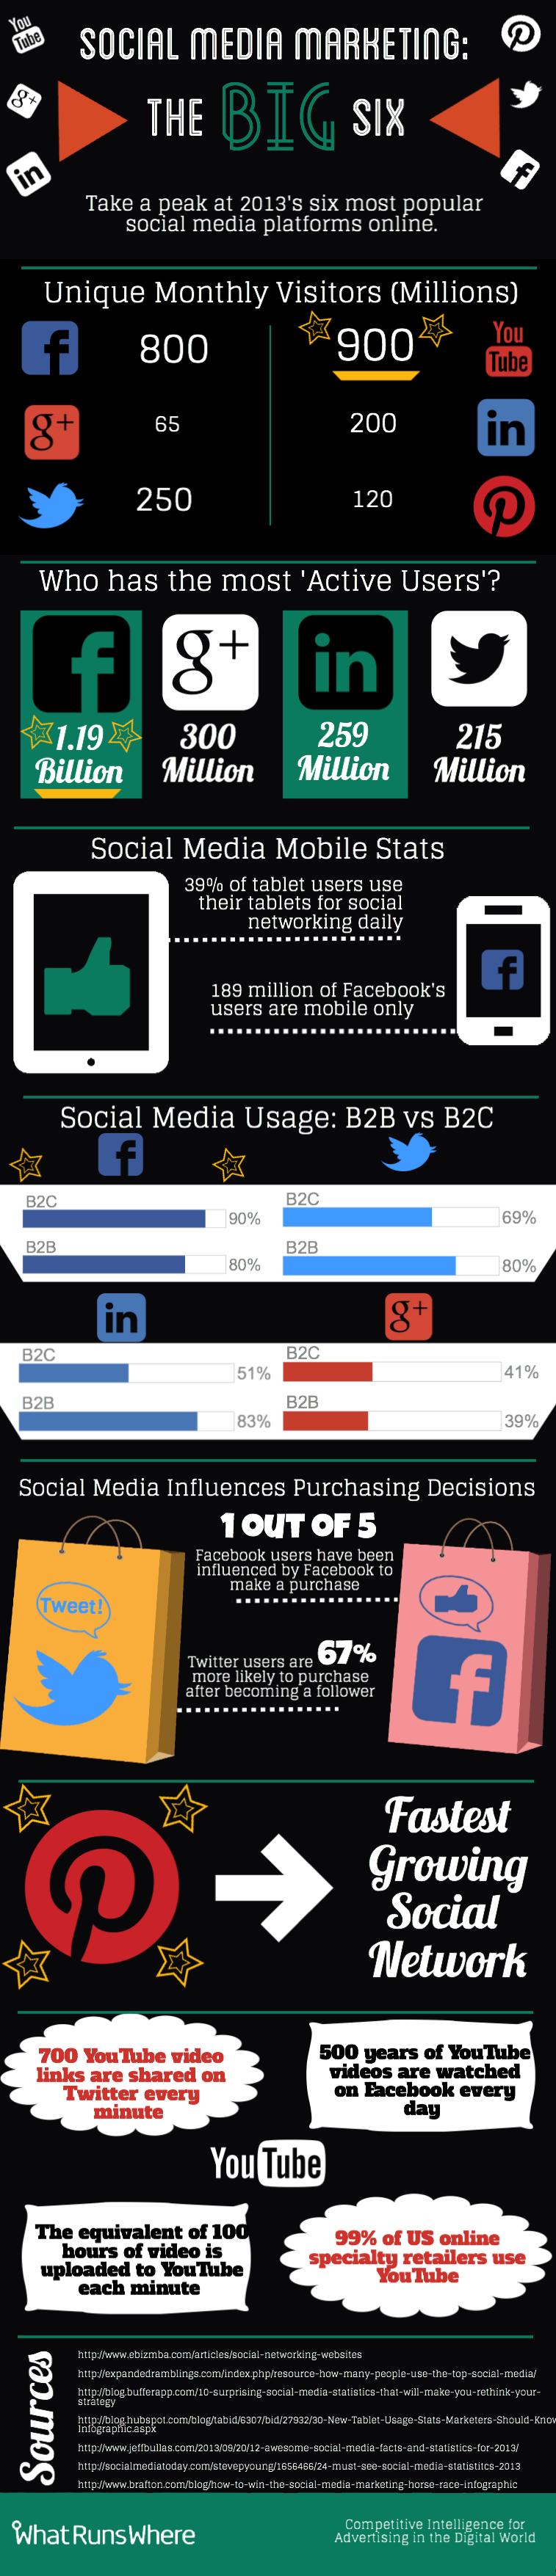 Social Media Marketing: los 6 grandes